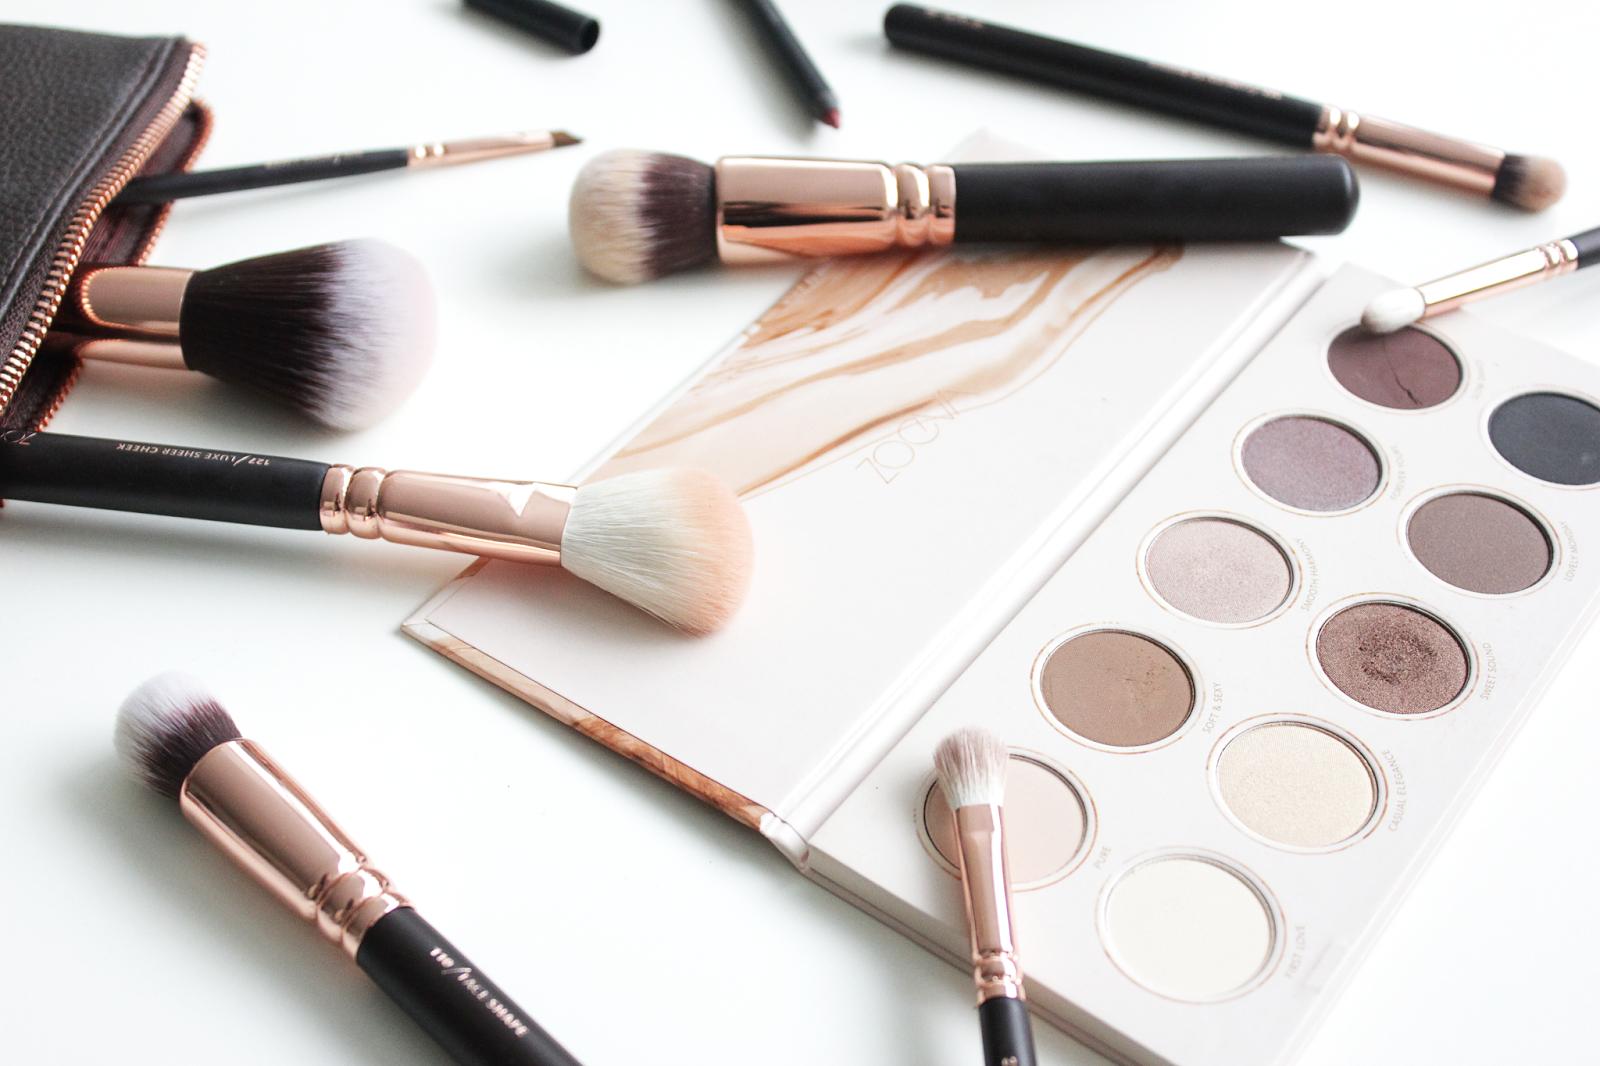 Zoeva Cosmetics, Rose Gold Makeup Brushes Rose gold